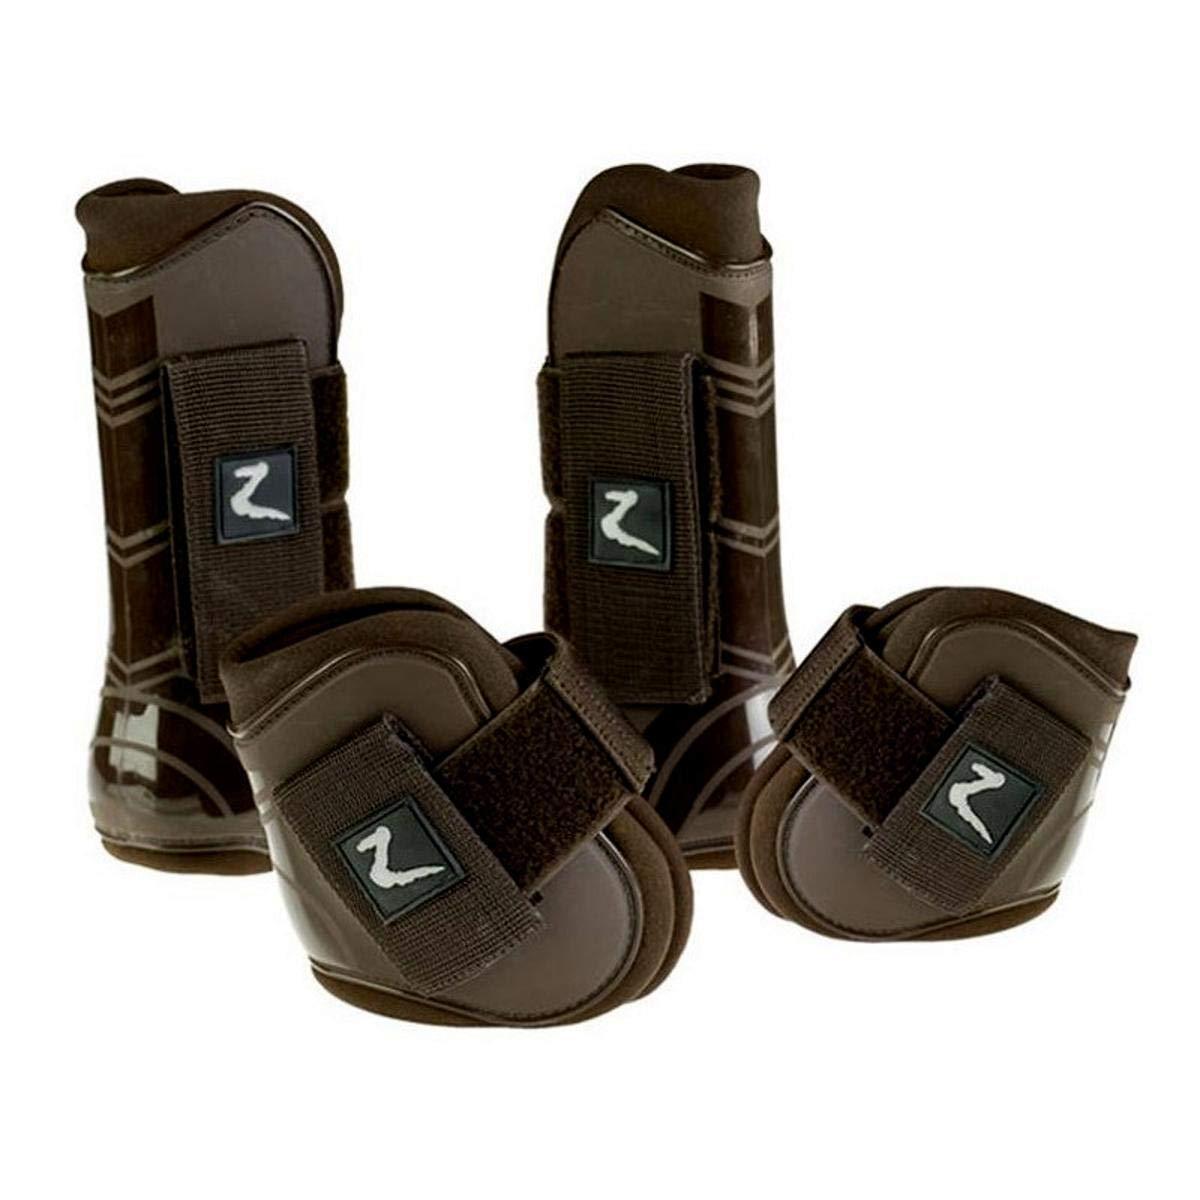 Horze Advanced ProTec Boot Set - Brown - Full